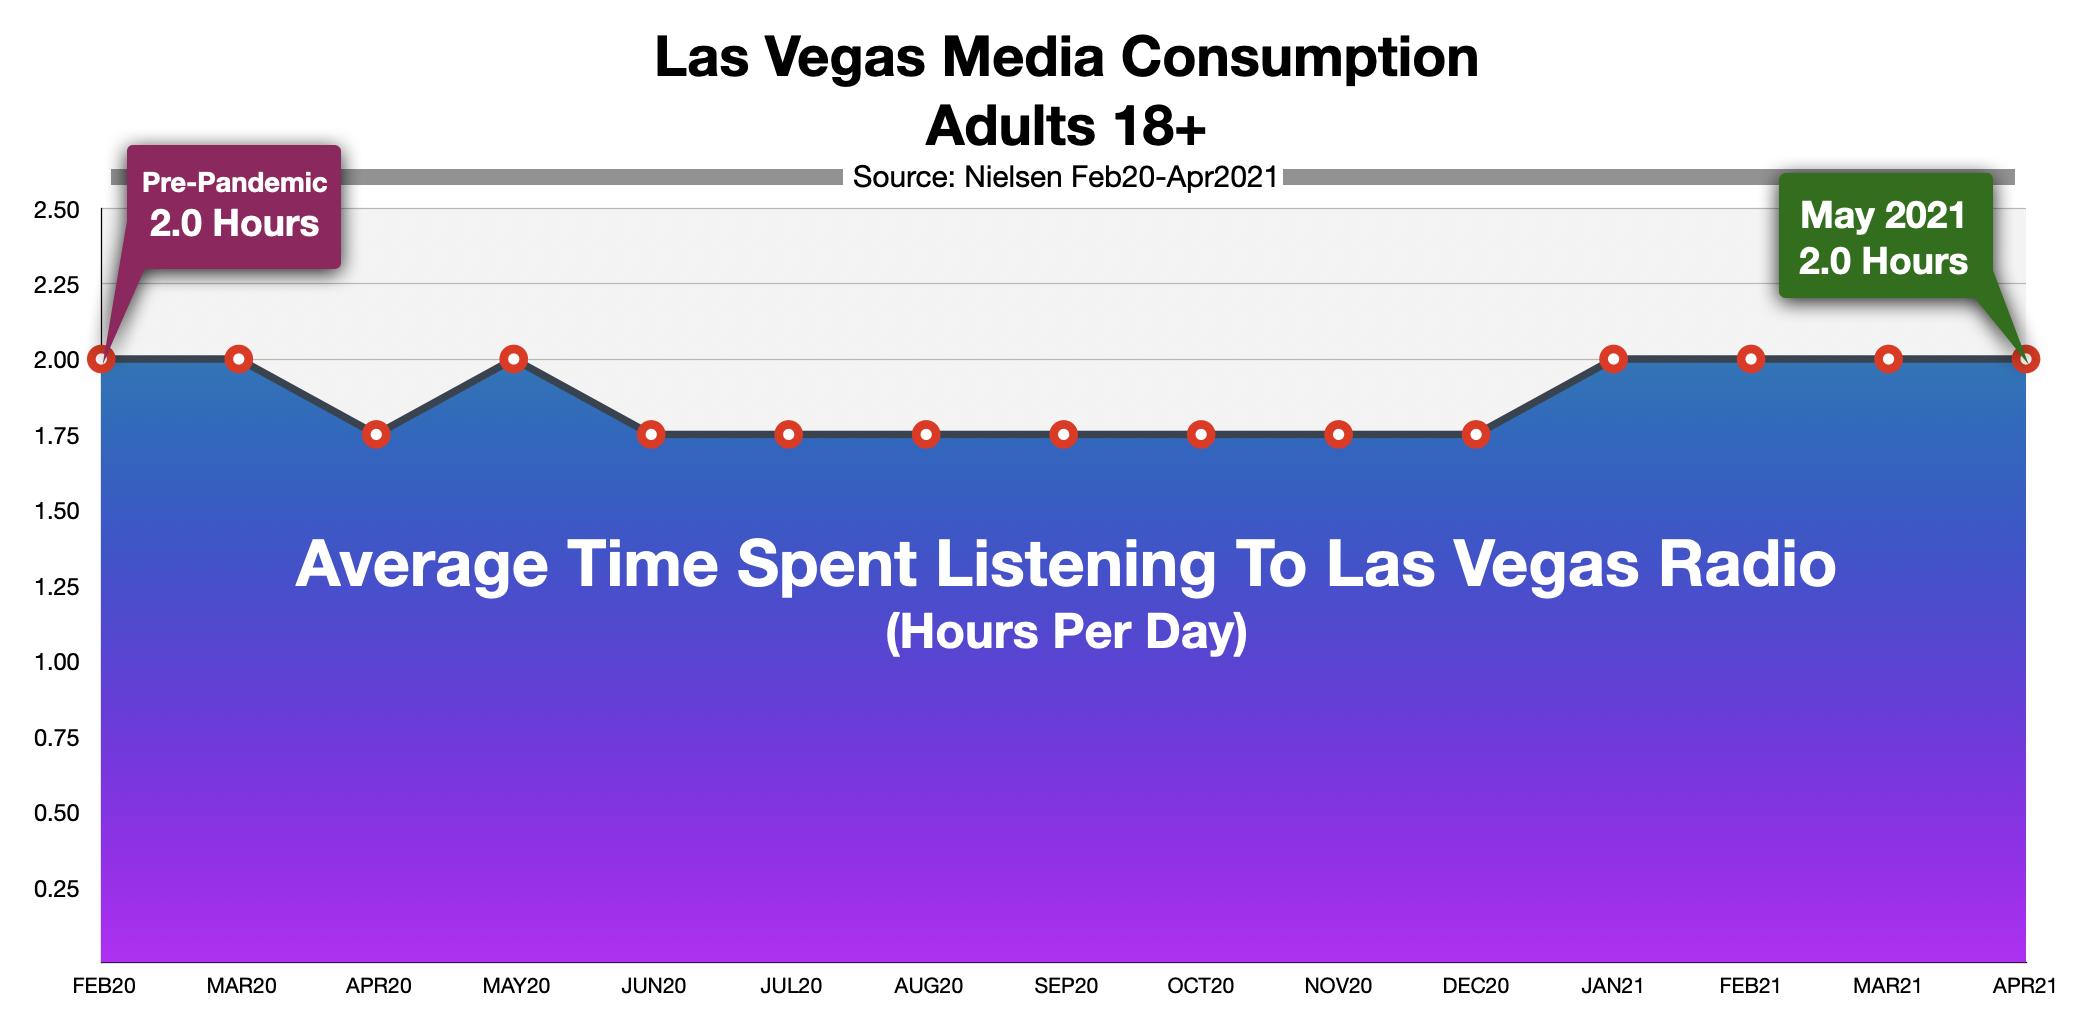 Advertising On Las Vegas Radio: Time Spent Listening 2021